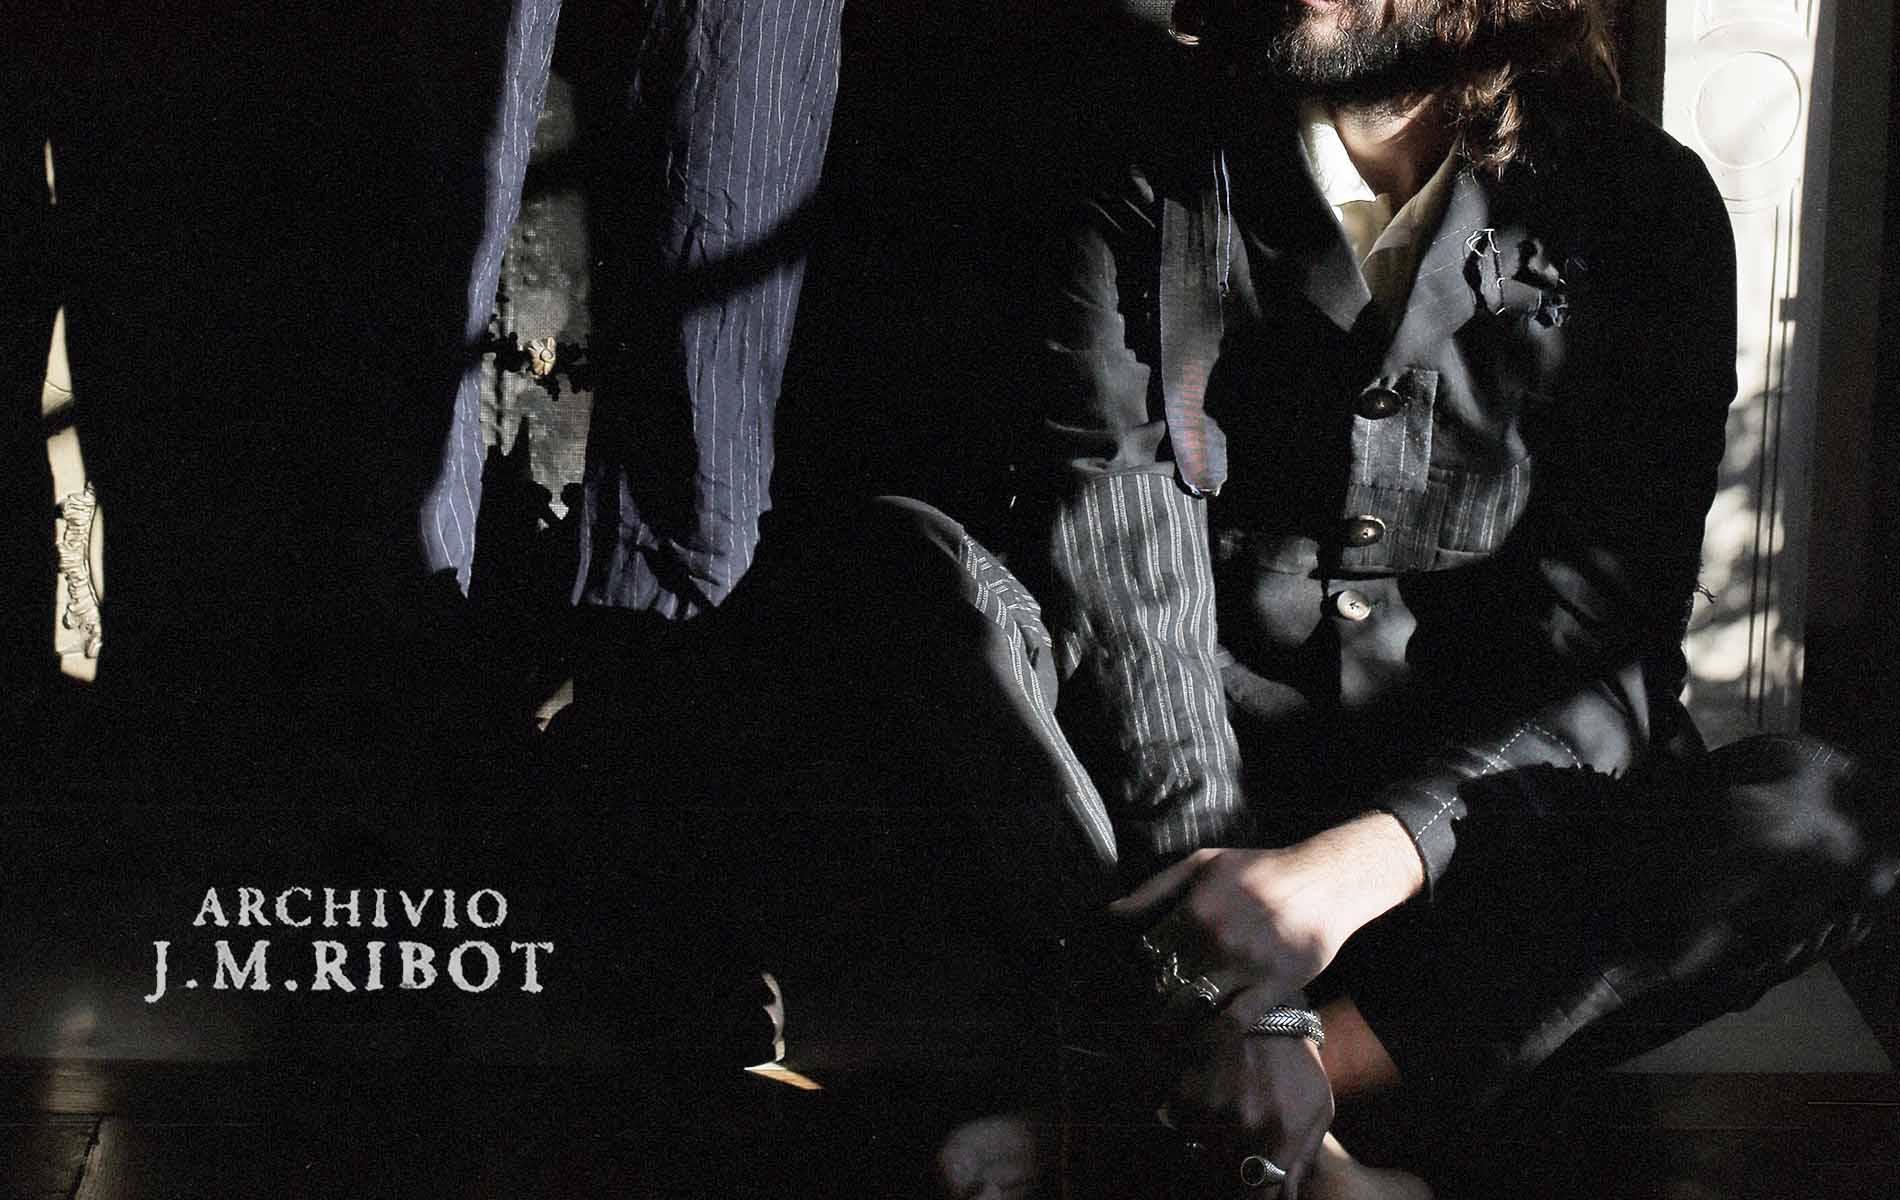 ARCHIVIO J.M.Ribot 2020-21Autumn&Winter image look